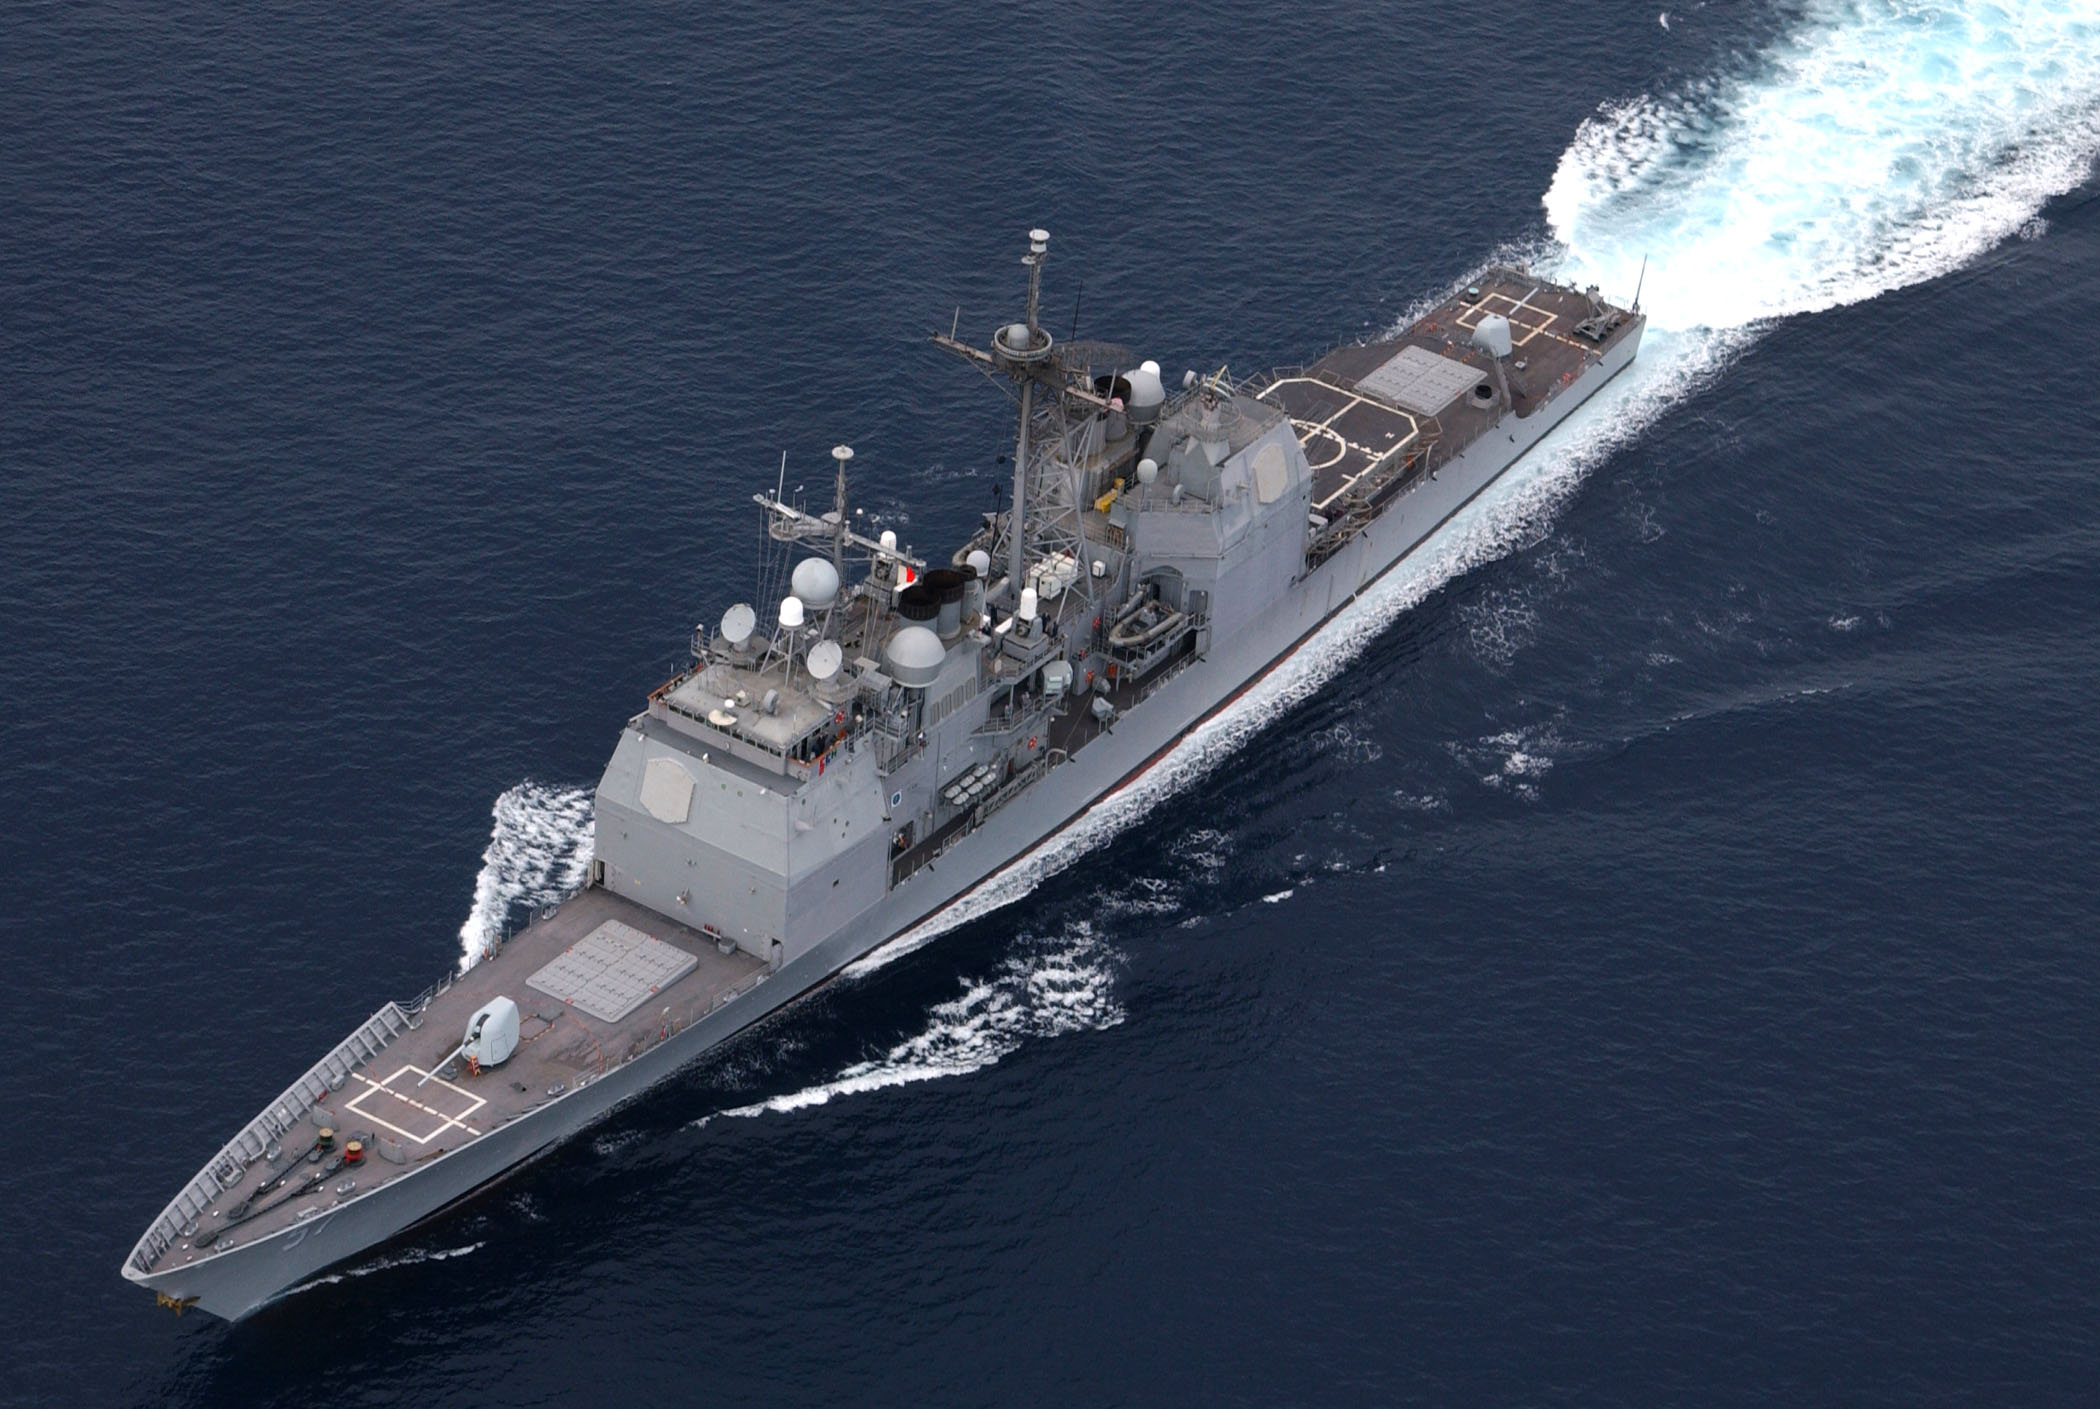 USS Lake Champlain (CG 57) krążownik typu Ticonderoga